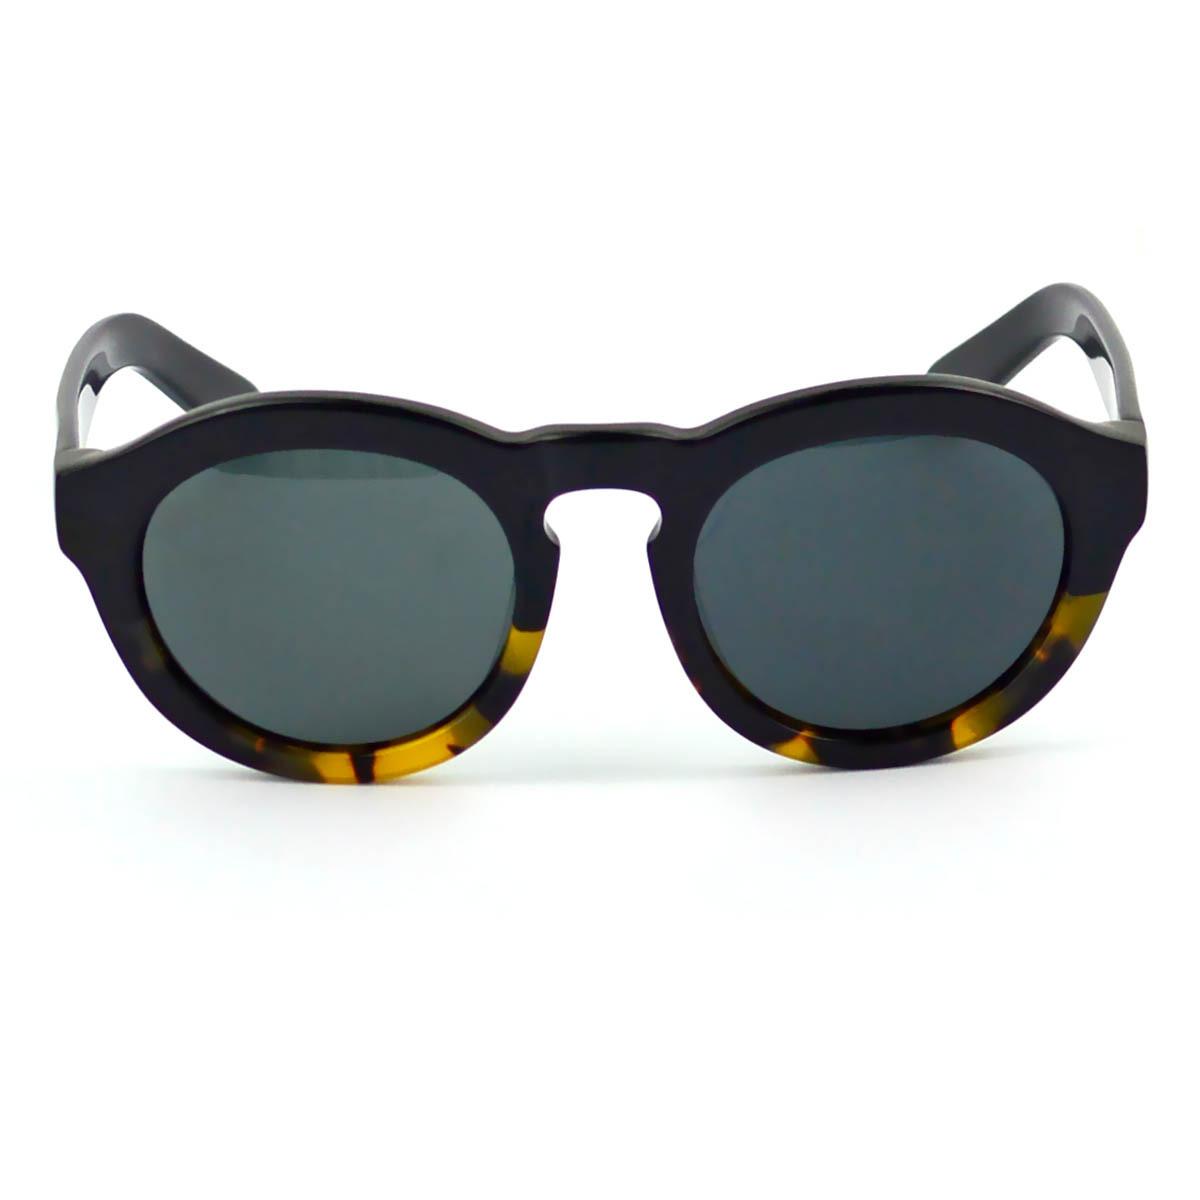 3d线偏光眼镜_偏光太阳眼镜_广州彭博琥珀色醋酸乙酯偏光太阳眼镜 uv400紫外线 ...